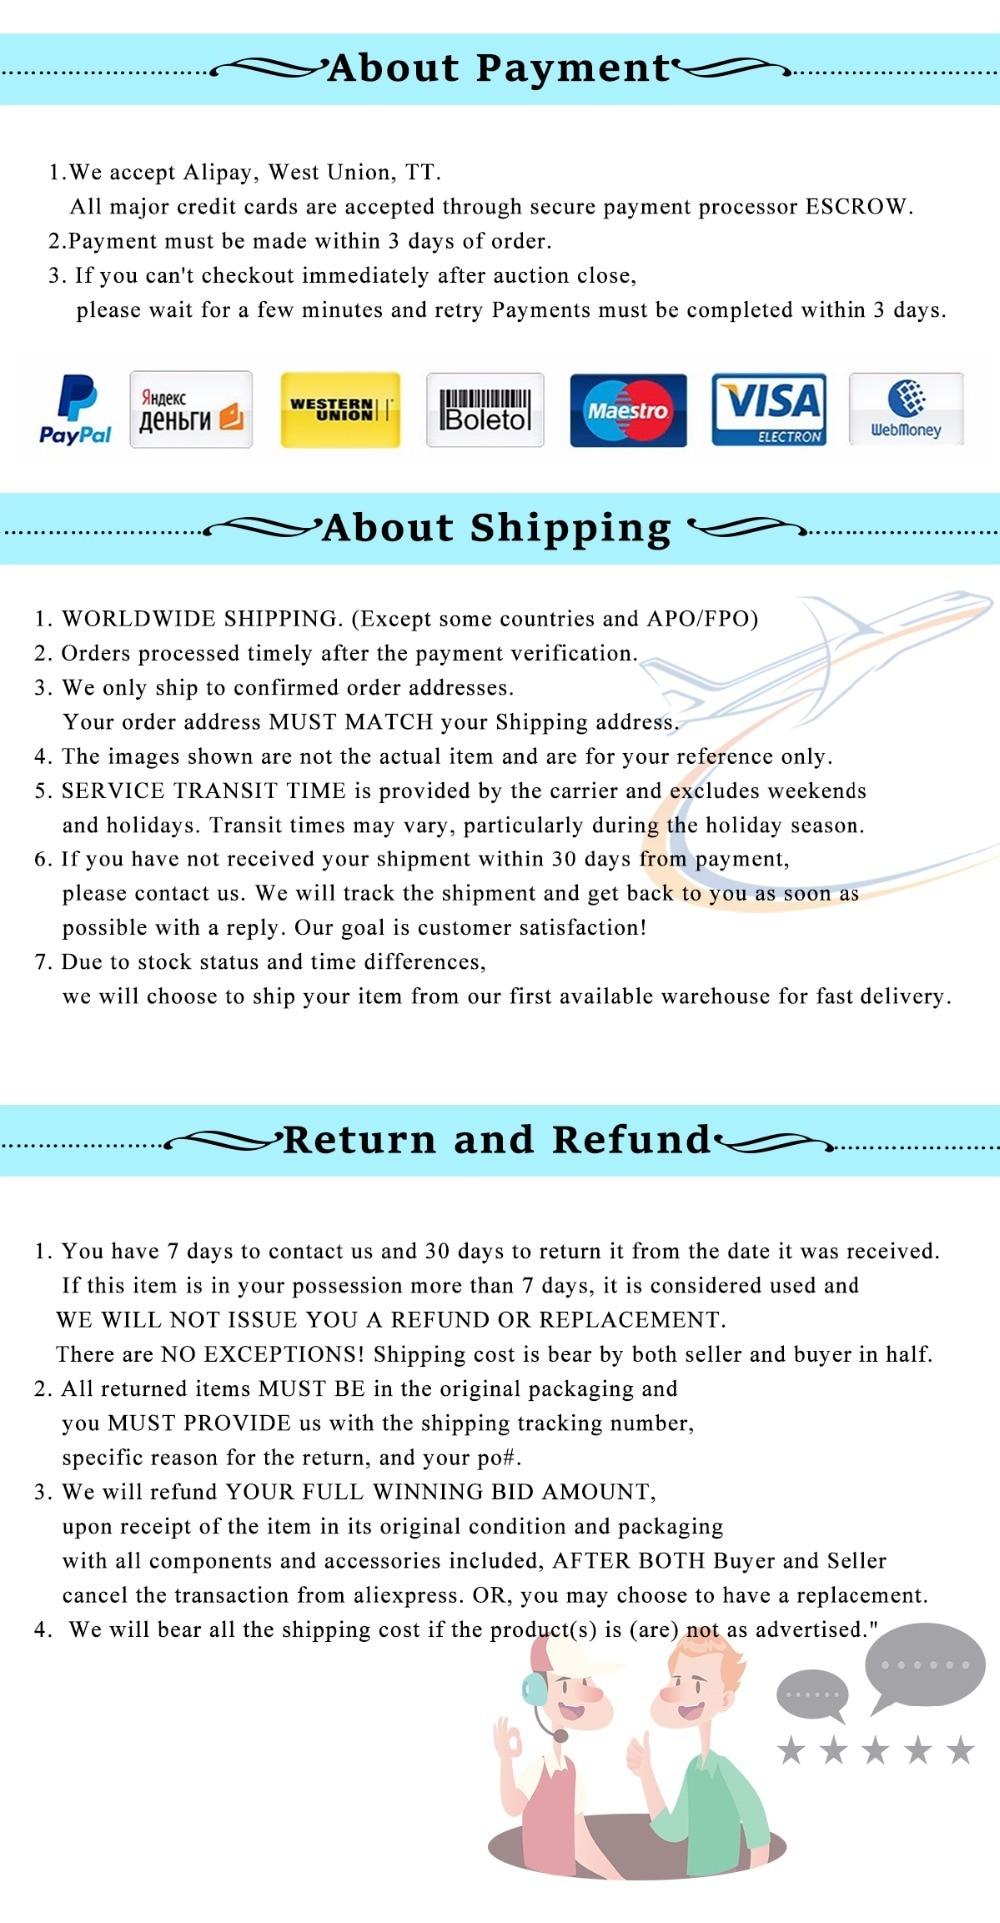 payment shippment refund